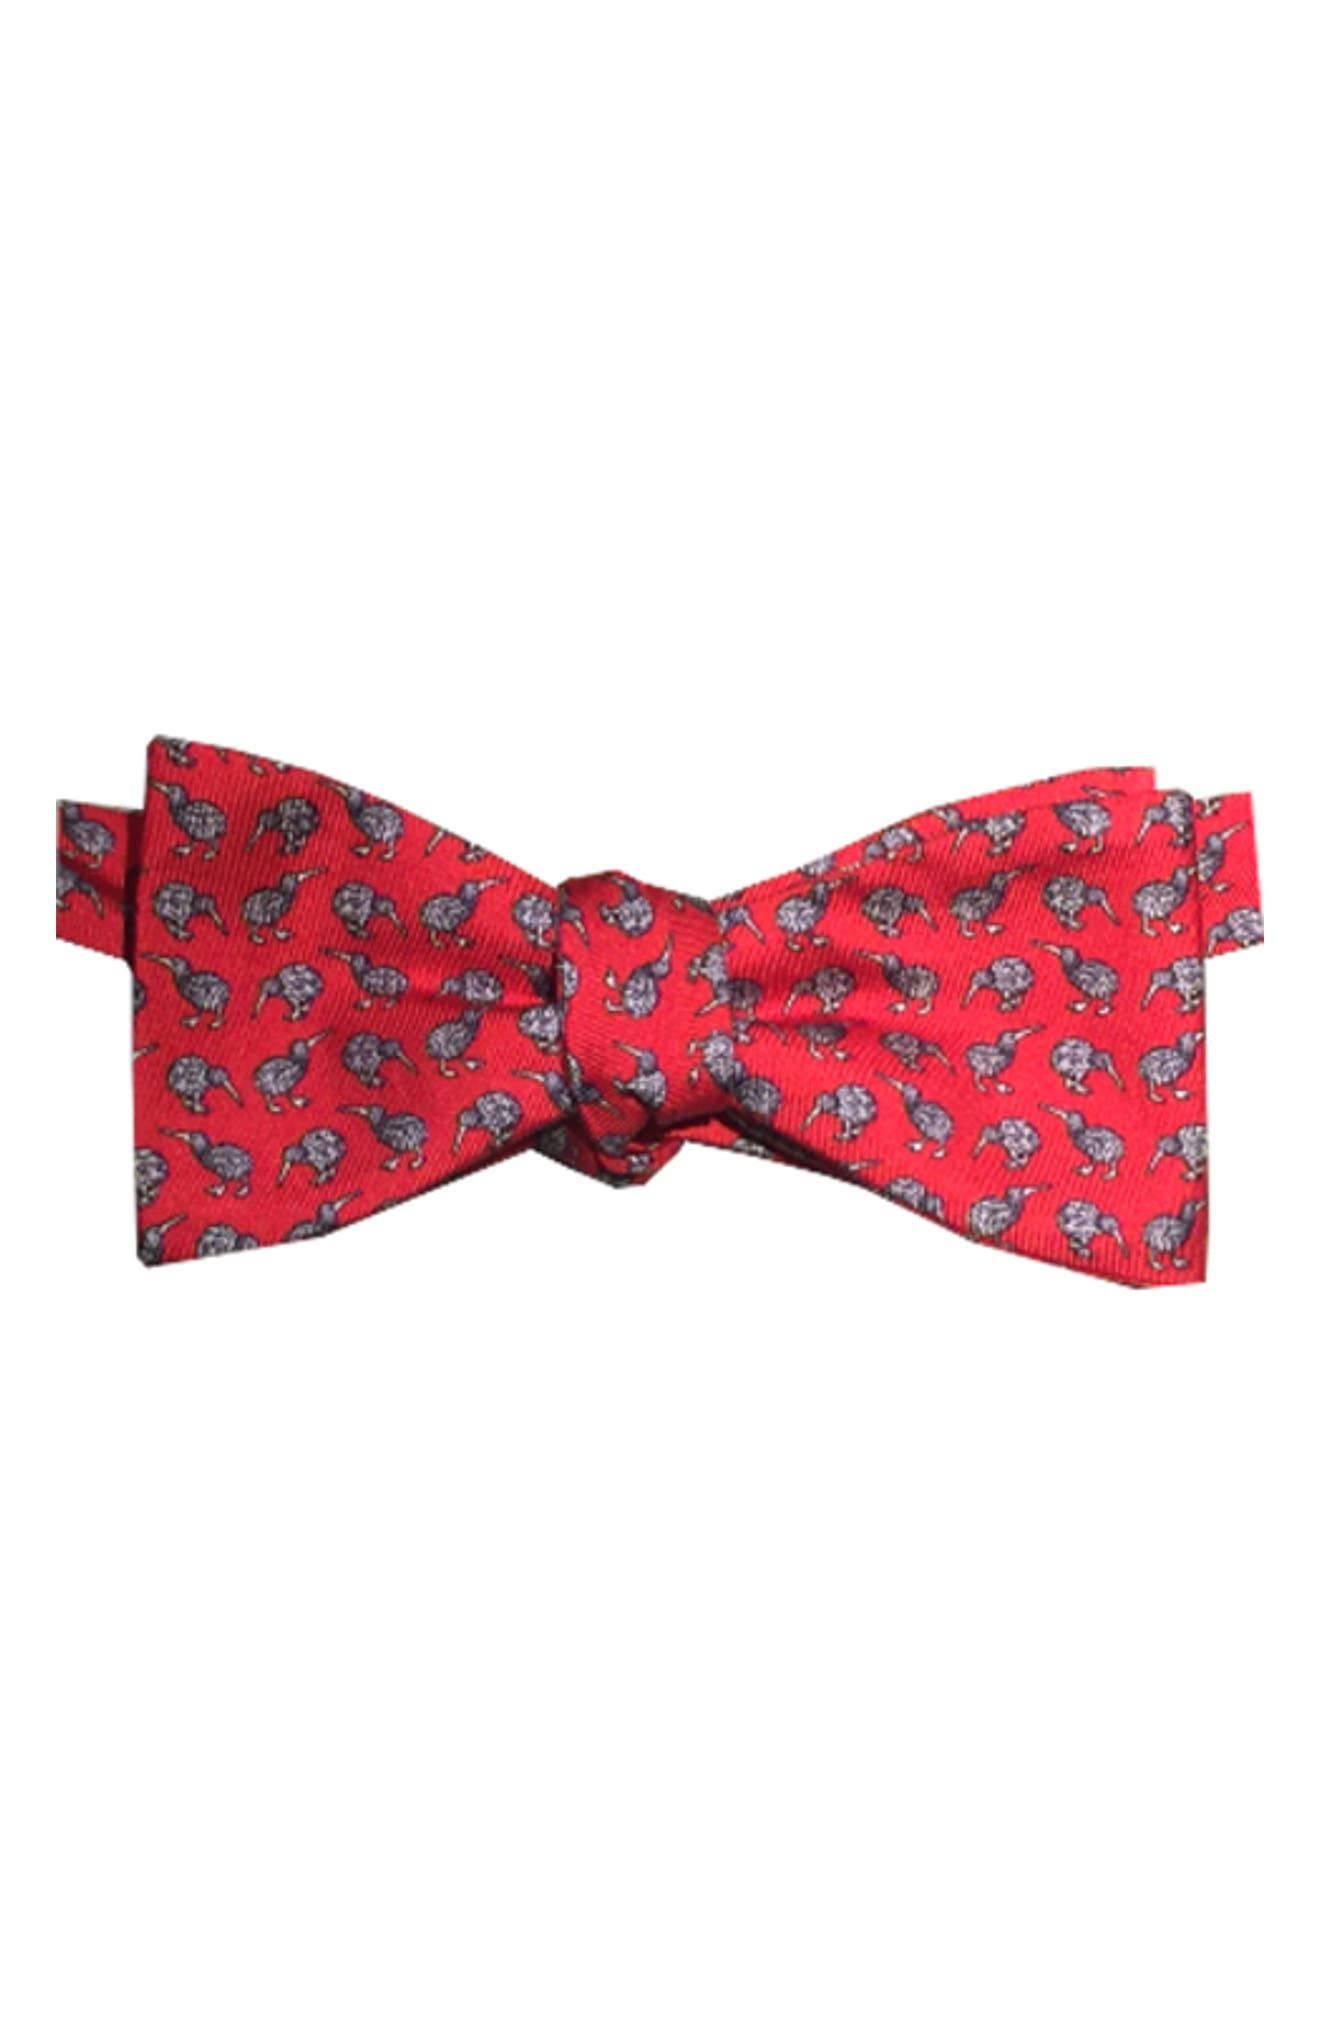 Cheeky Kiwi Silk Bow Tie,                             Main thumbnail 1, color,                             Red